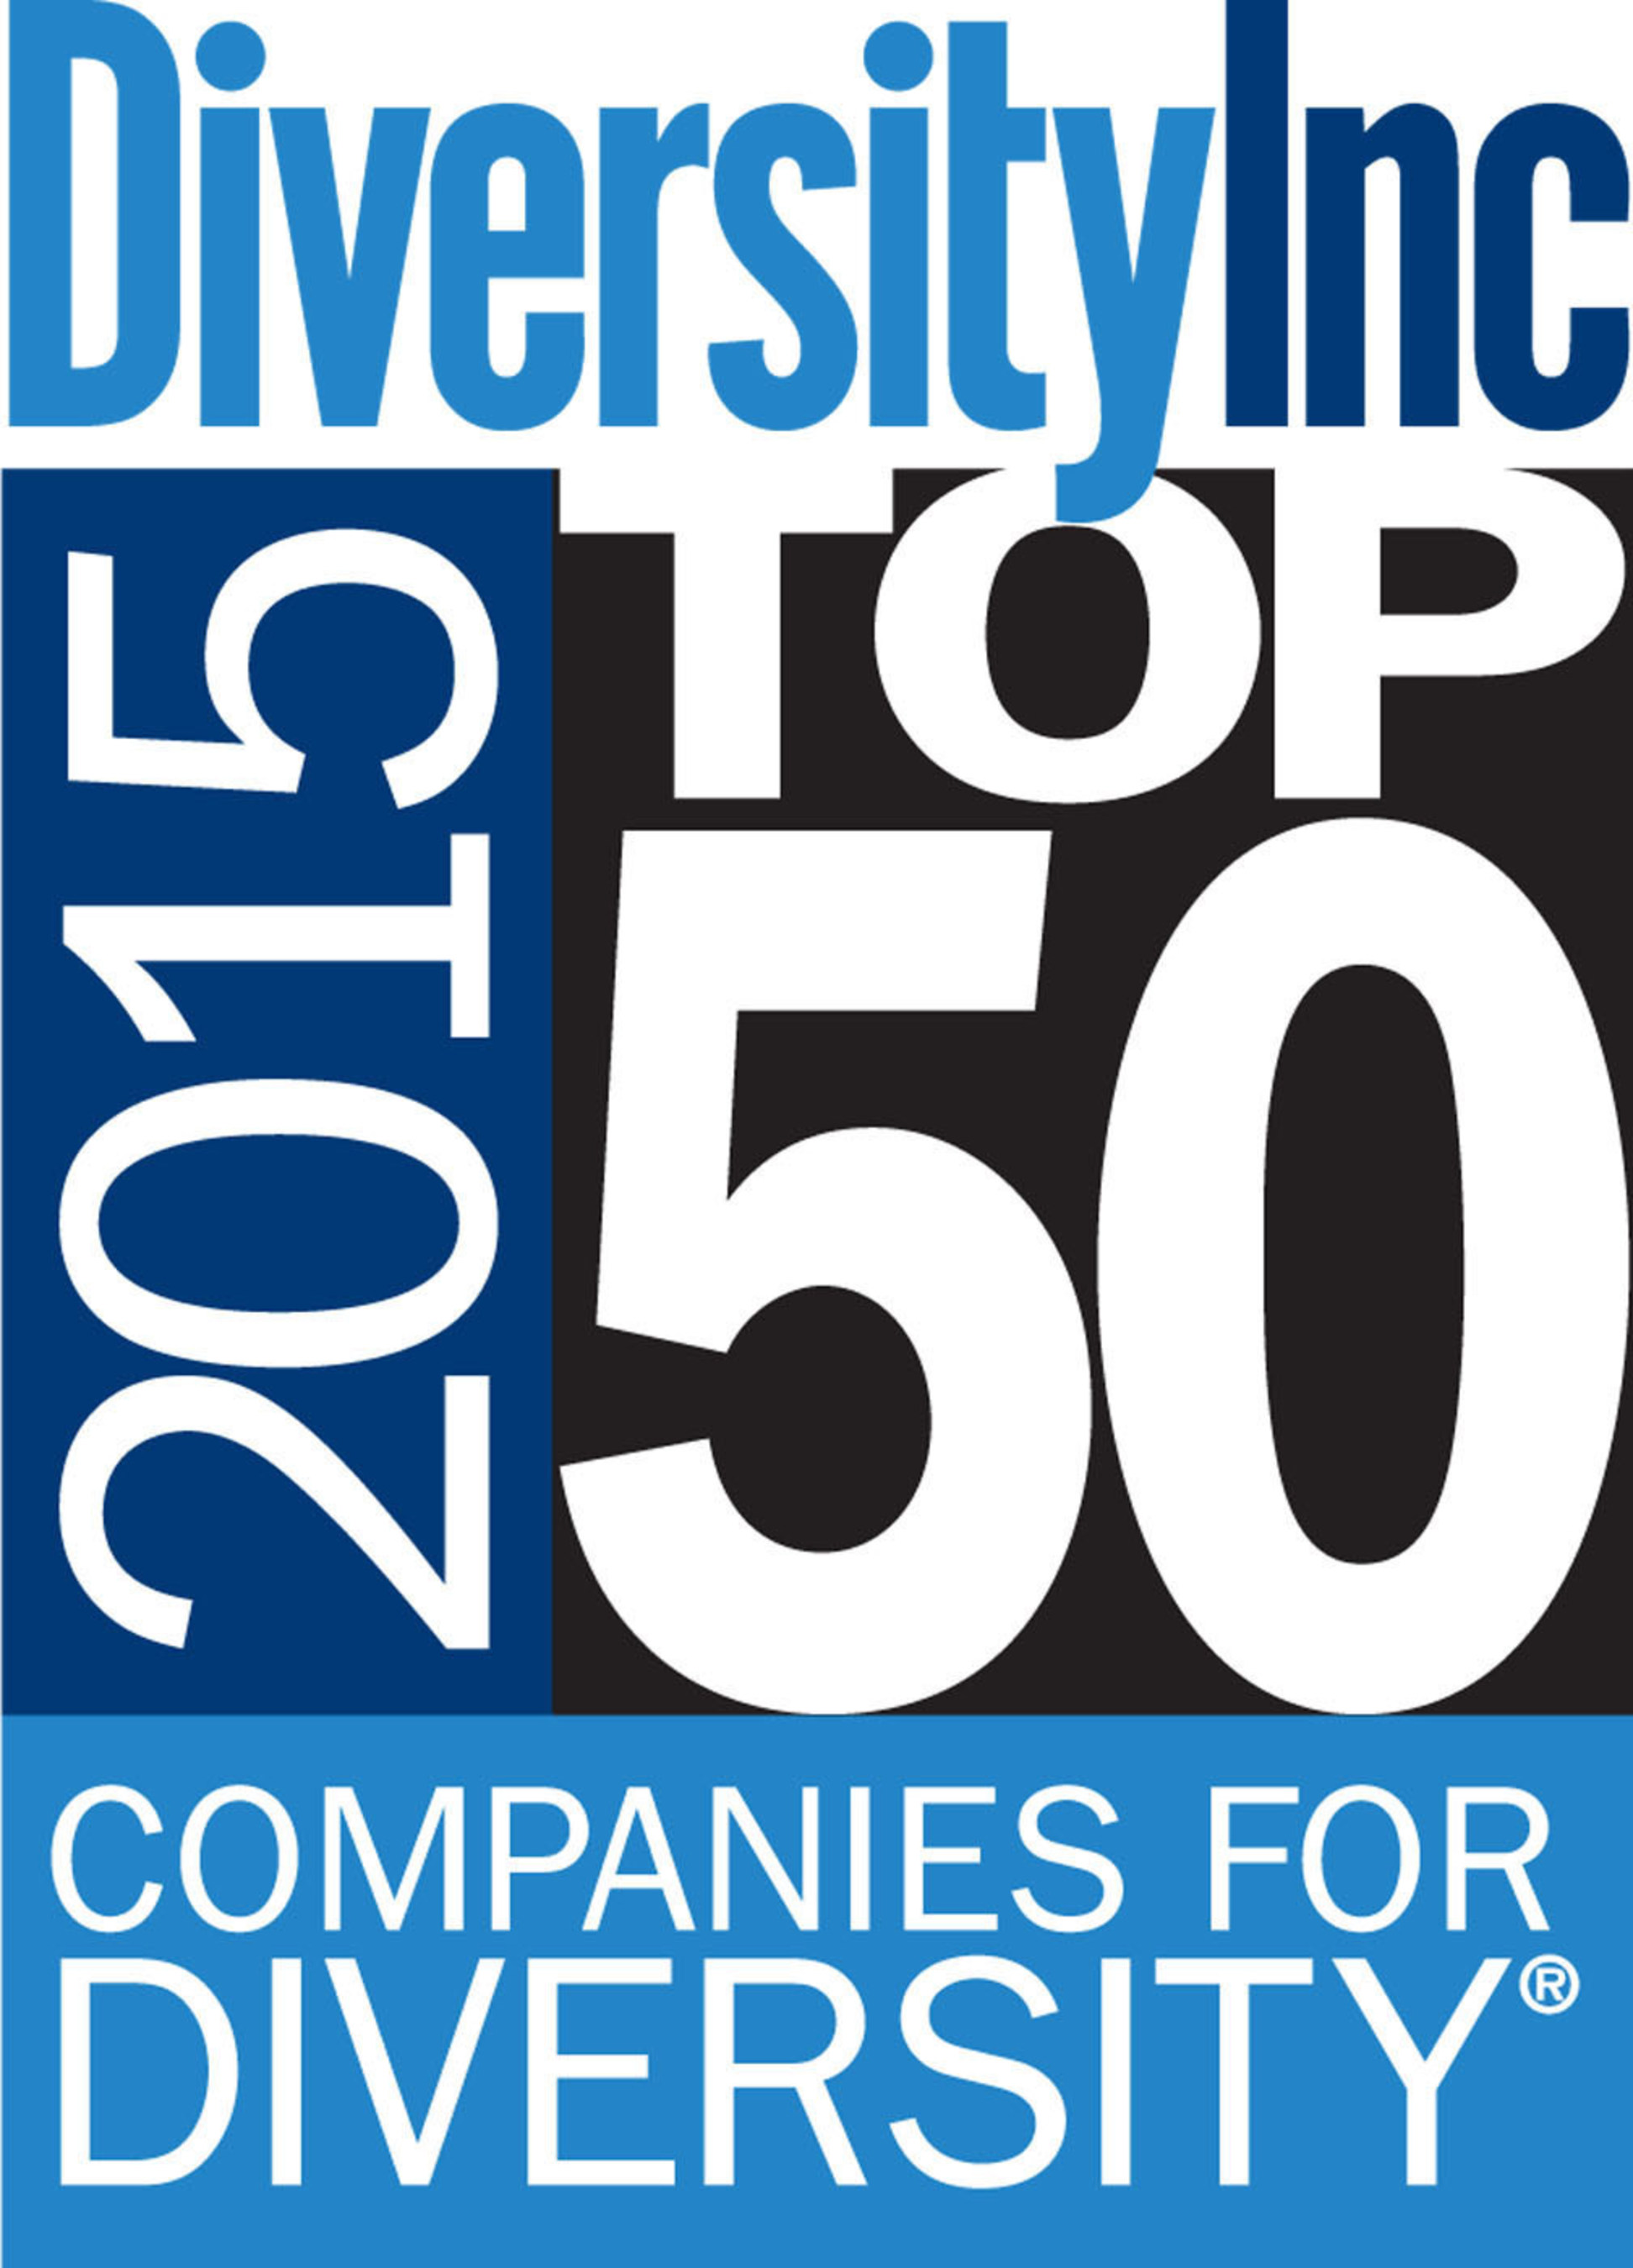 DiversityInc Top 50 Companies for Diversity Logo